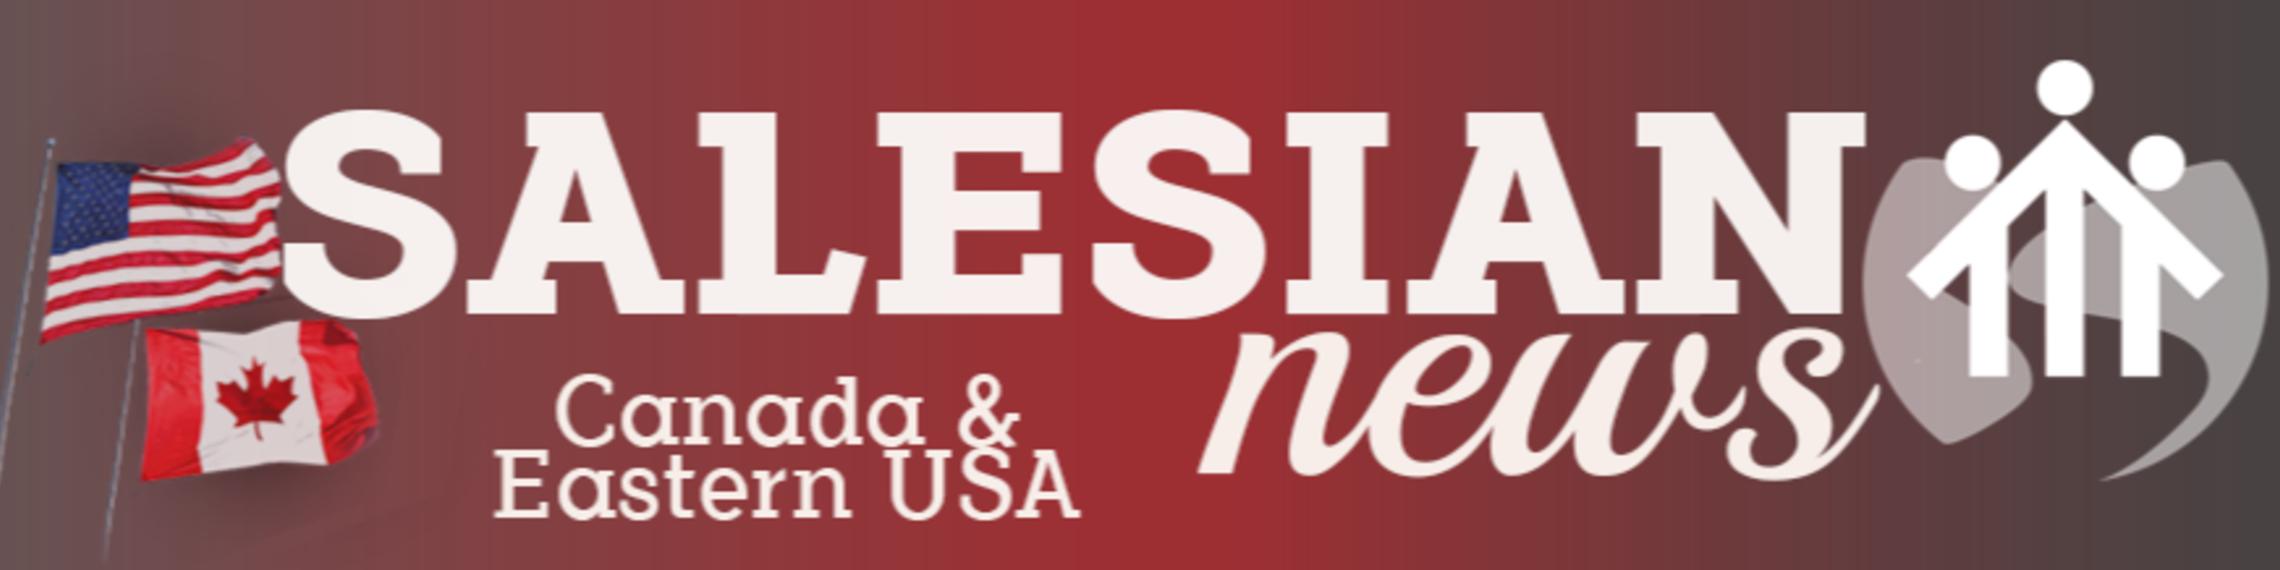 Salesian News Logo